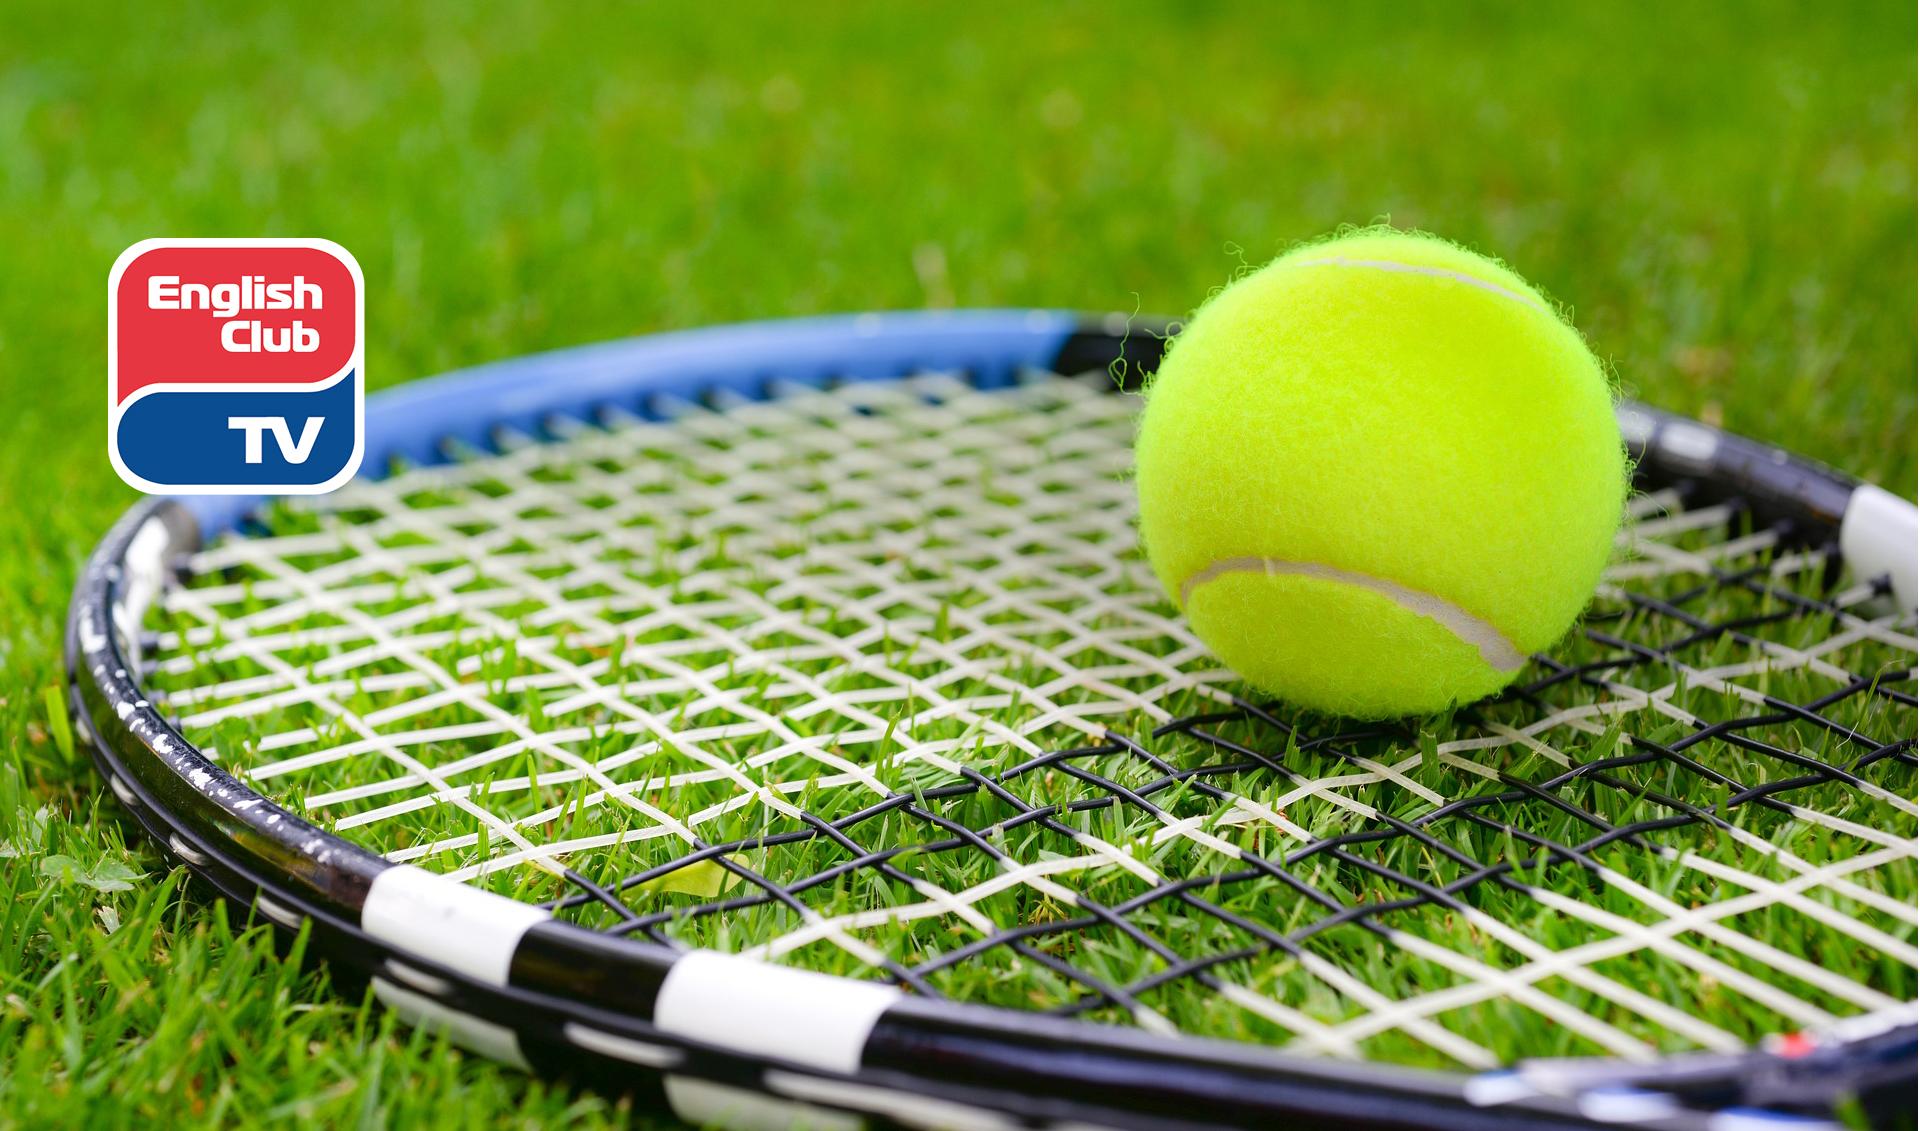 tennis-3437567_1920 copy